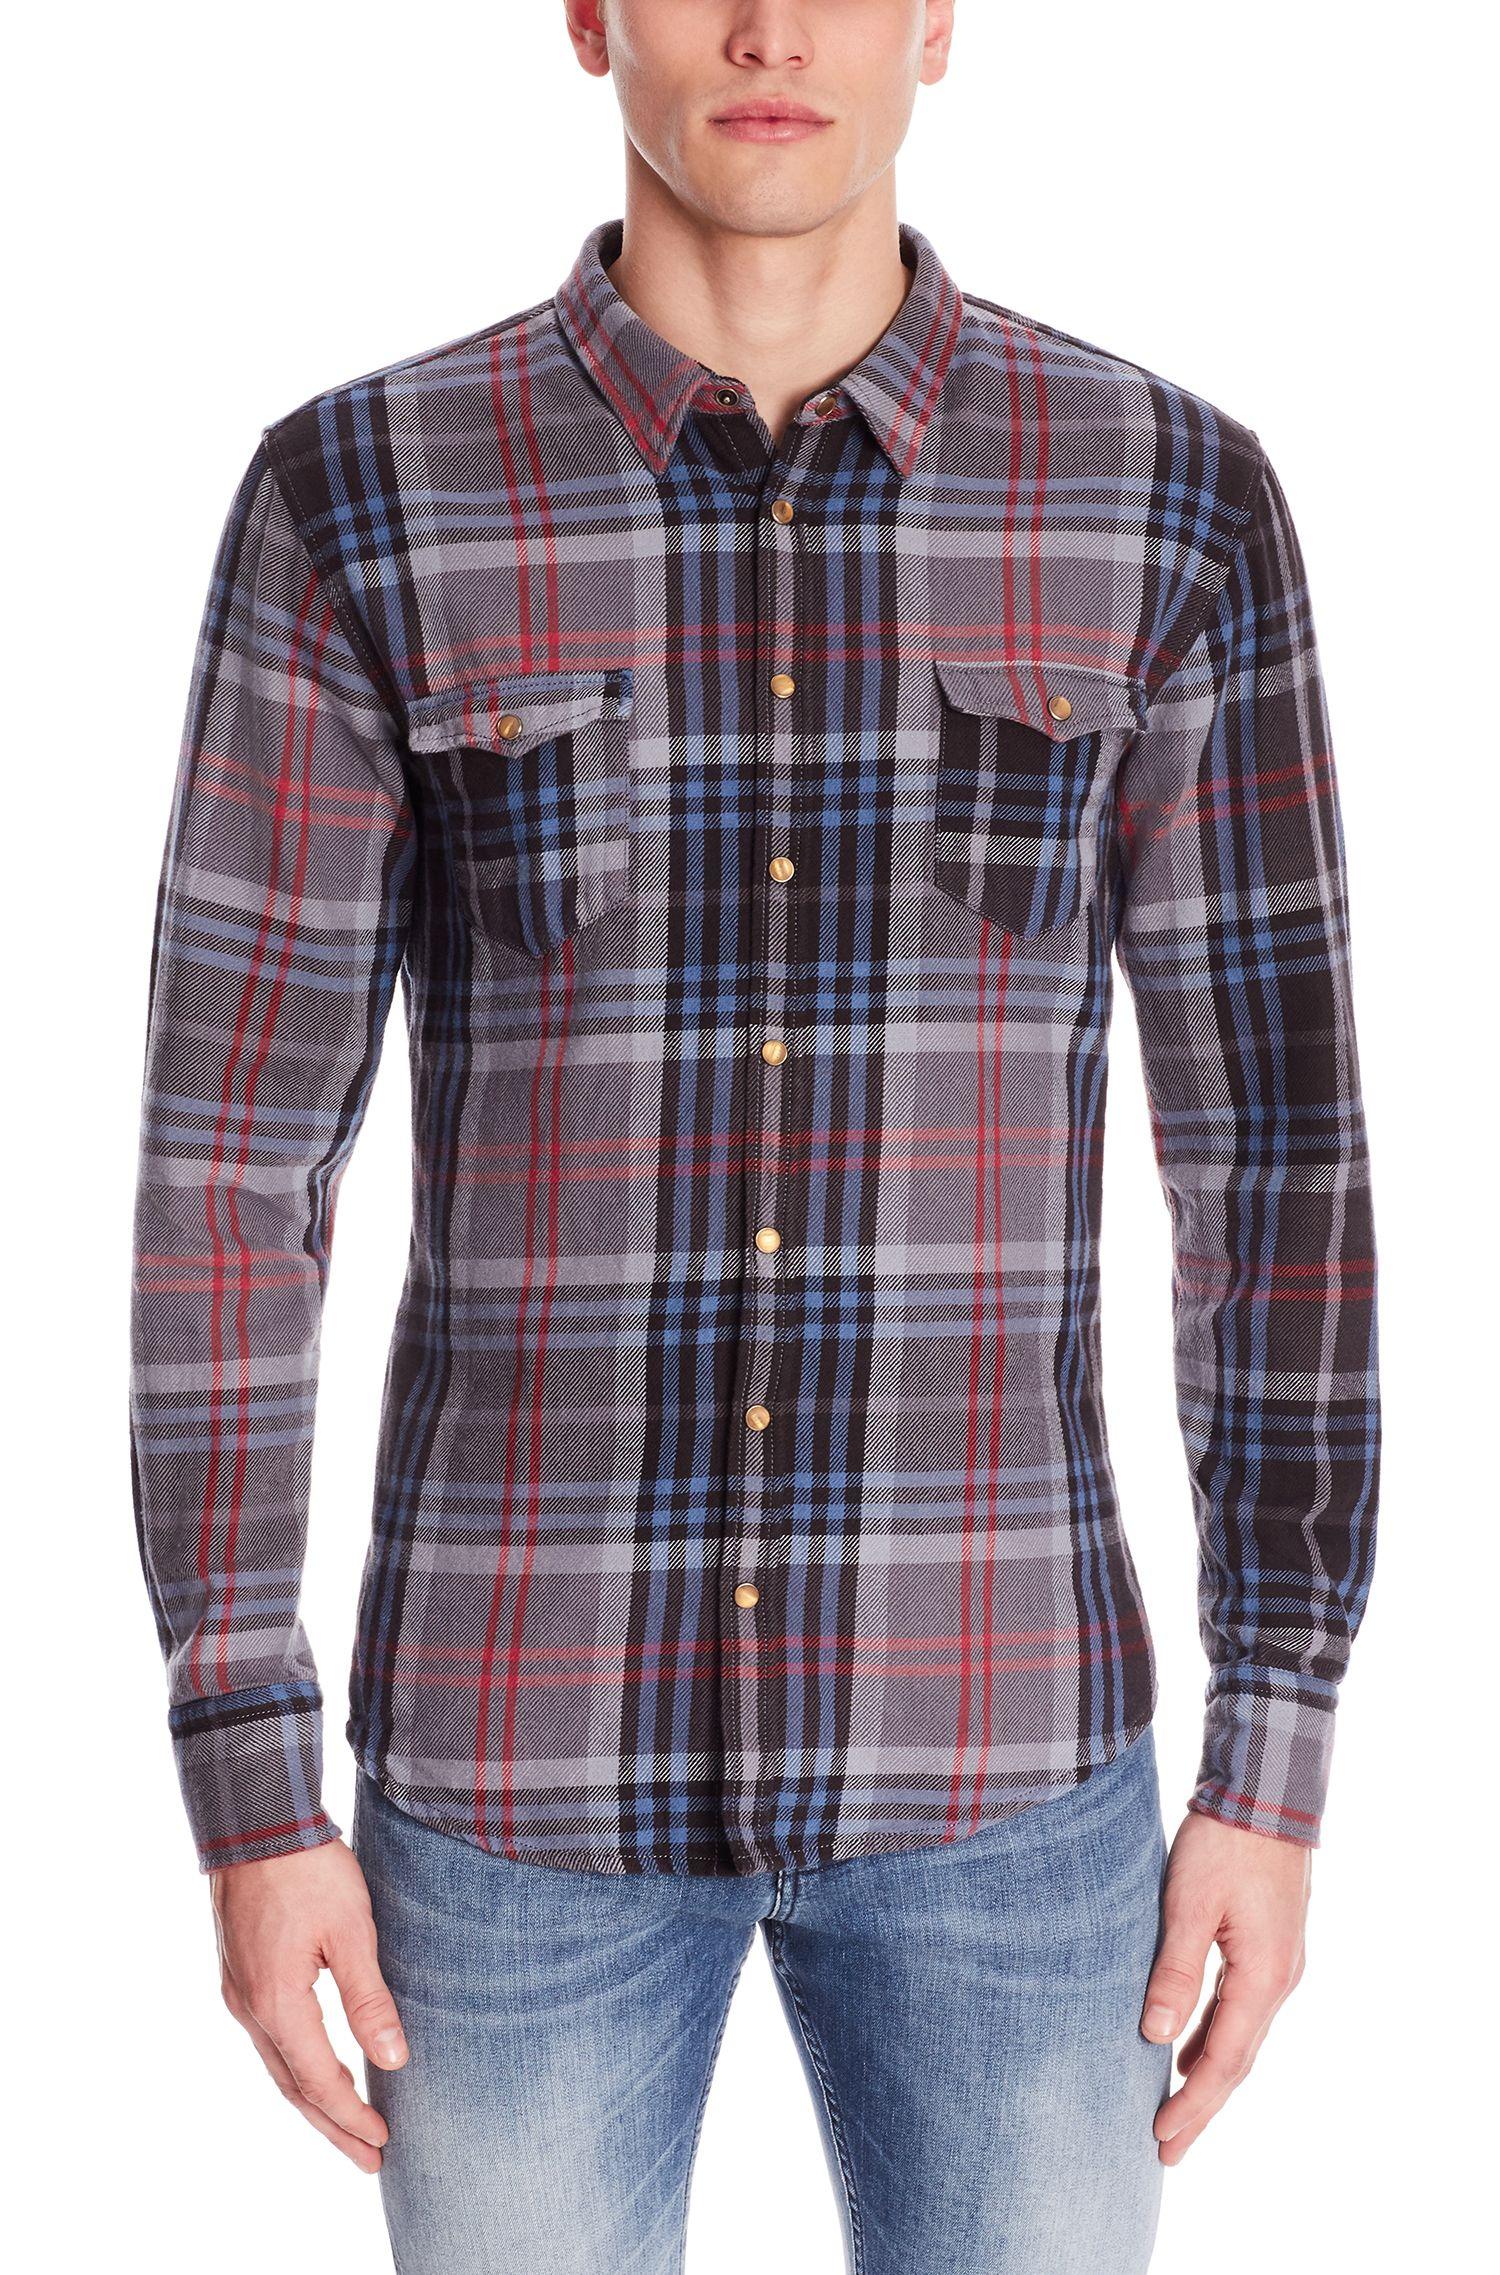 Plaid Cotton Button Down Shirt, Slim Fit | EdoslimE